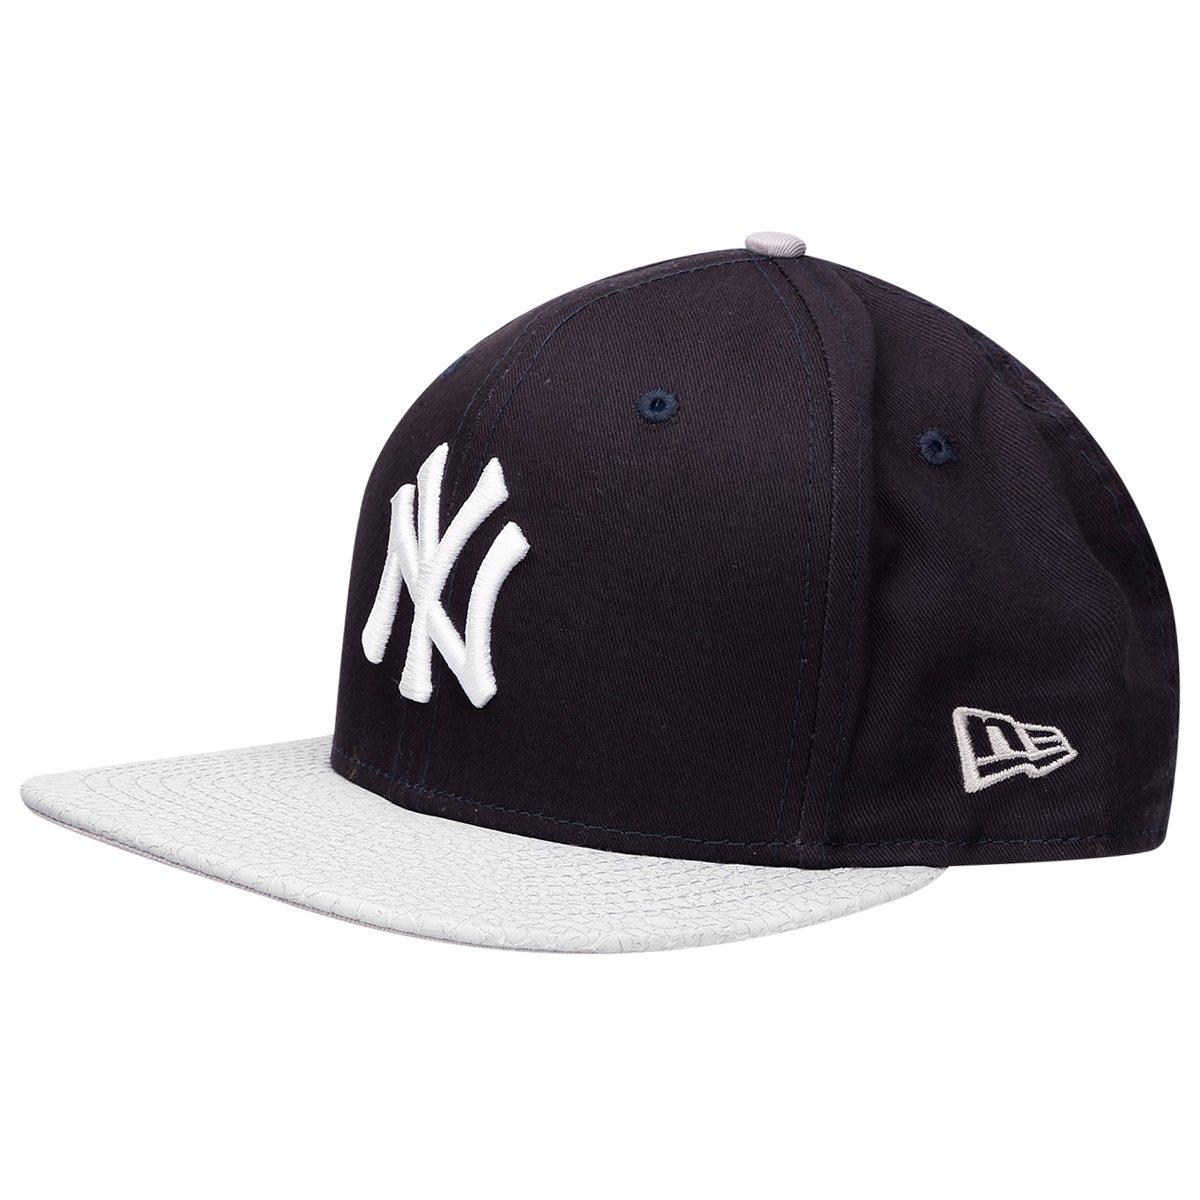 Boné New Era 950 MLB New York Yankees - Compre Agora  b5d33dcbe5f